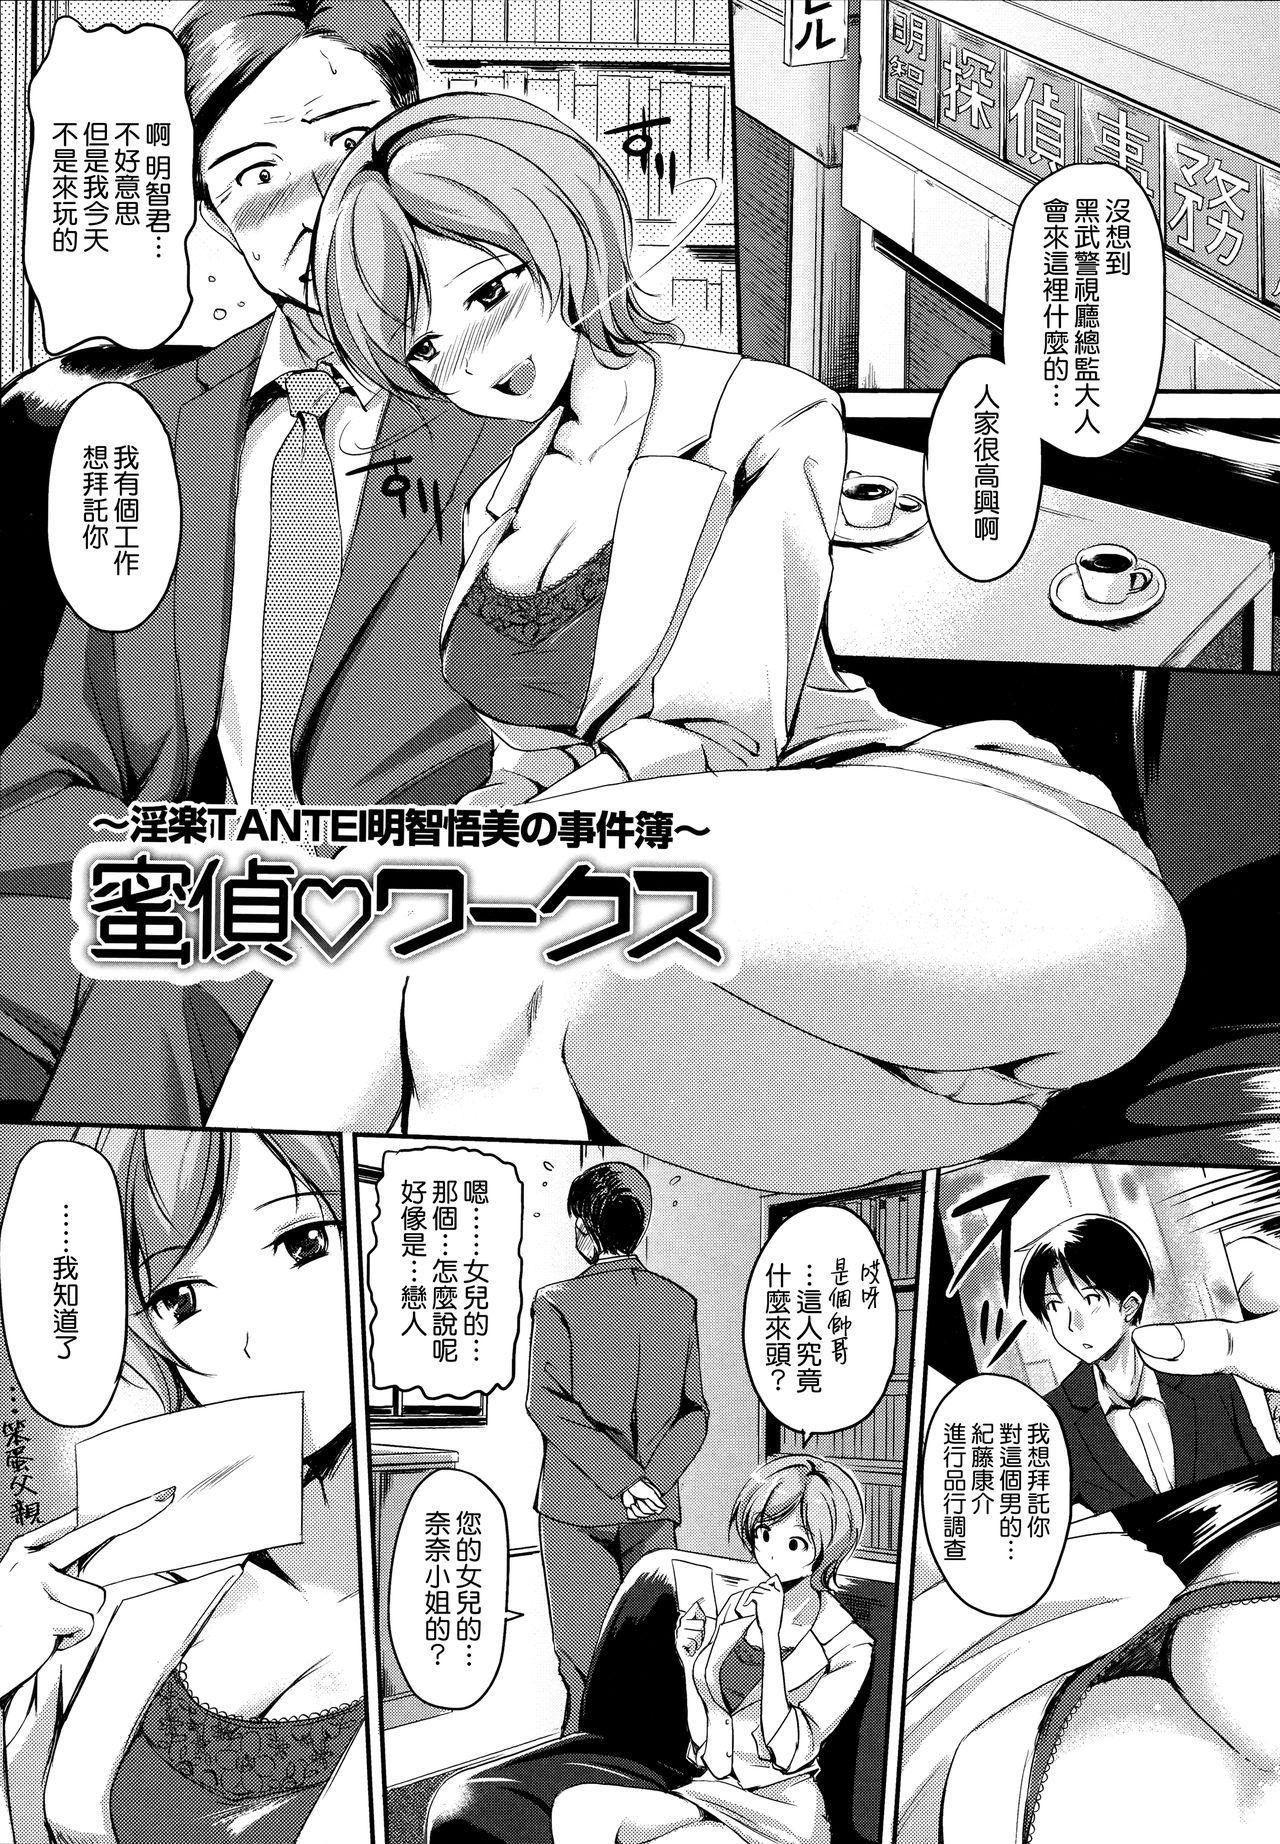 Kimagure Hanabira + Toranoana Leaflet 121